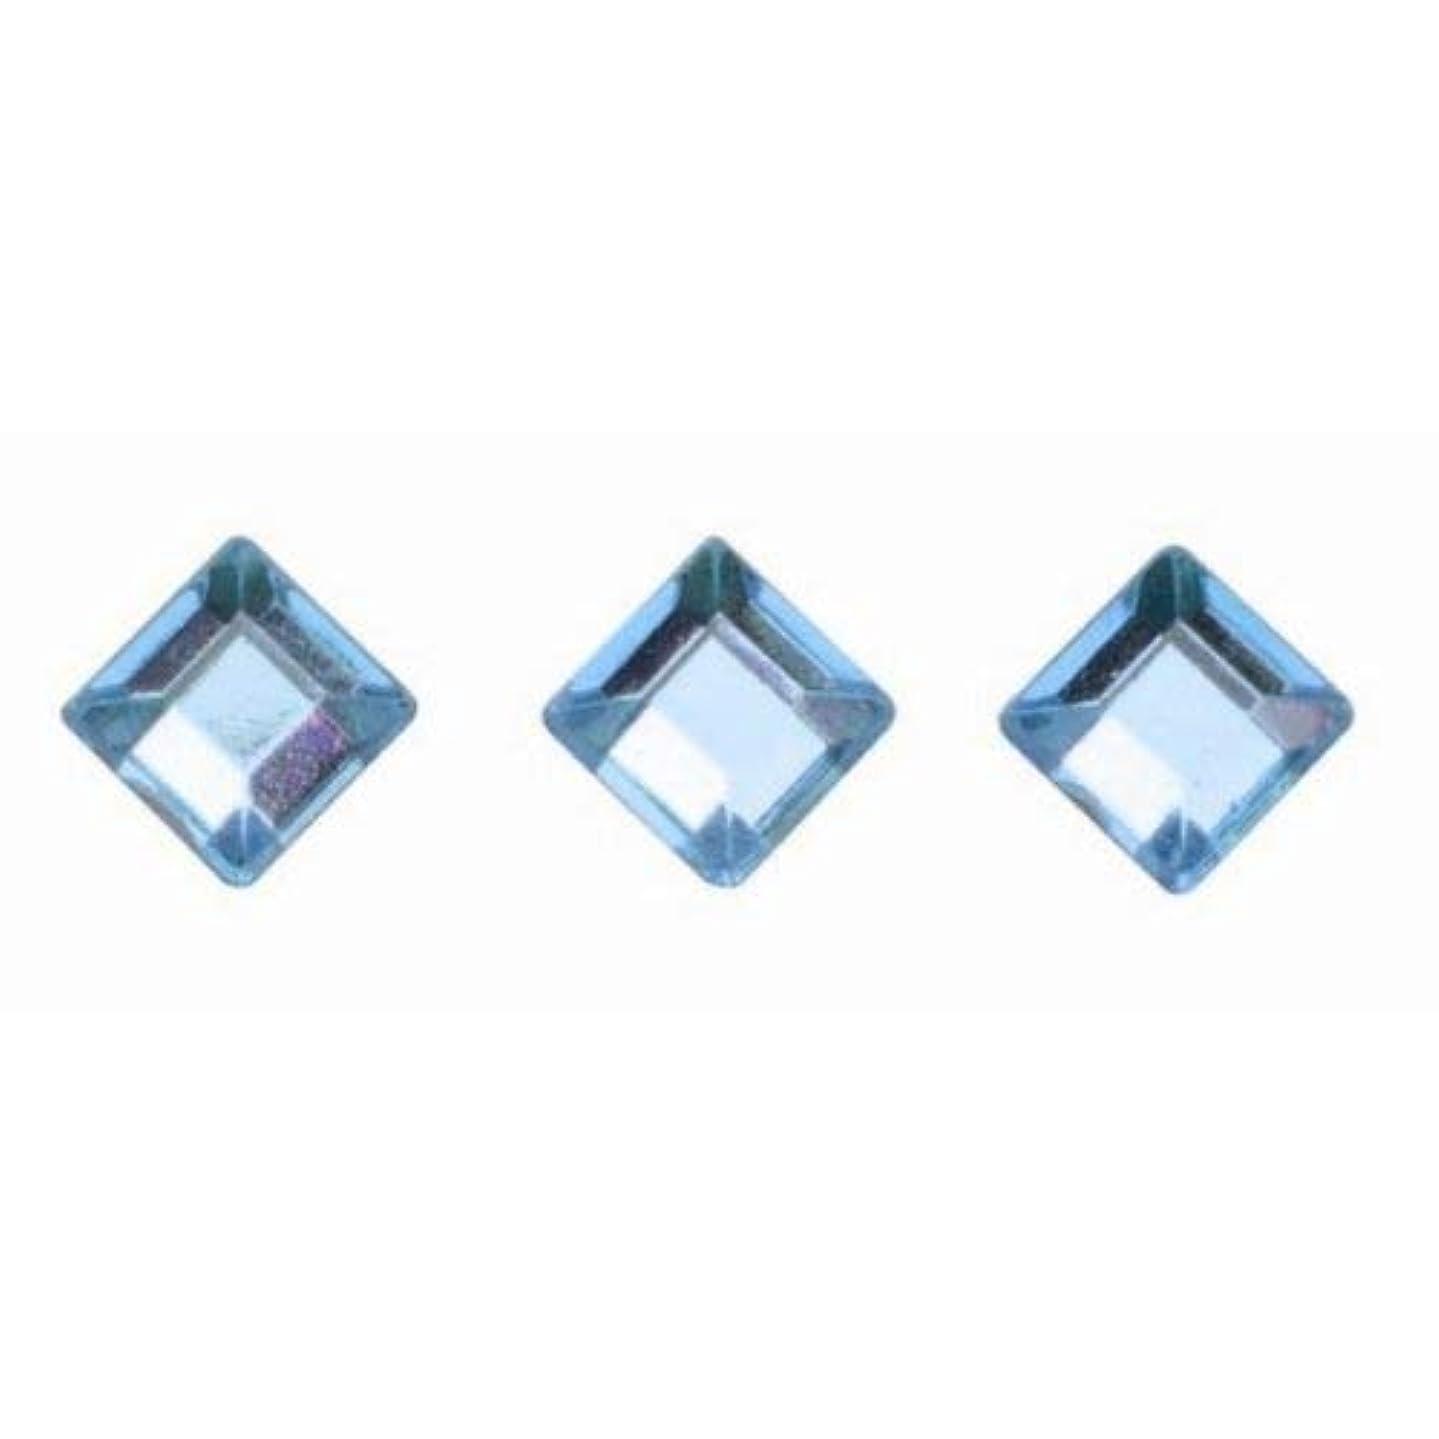 Glorex P & D Self-Adhesive Squares Light Blue, Plastic, Blue, 14.5?x 8.6?x 0.2?cm